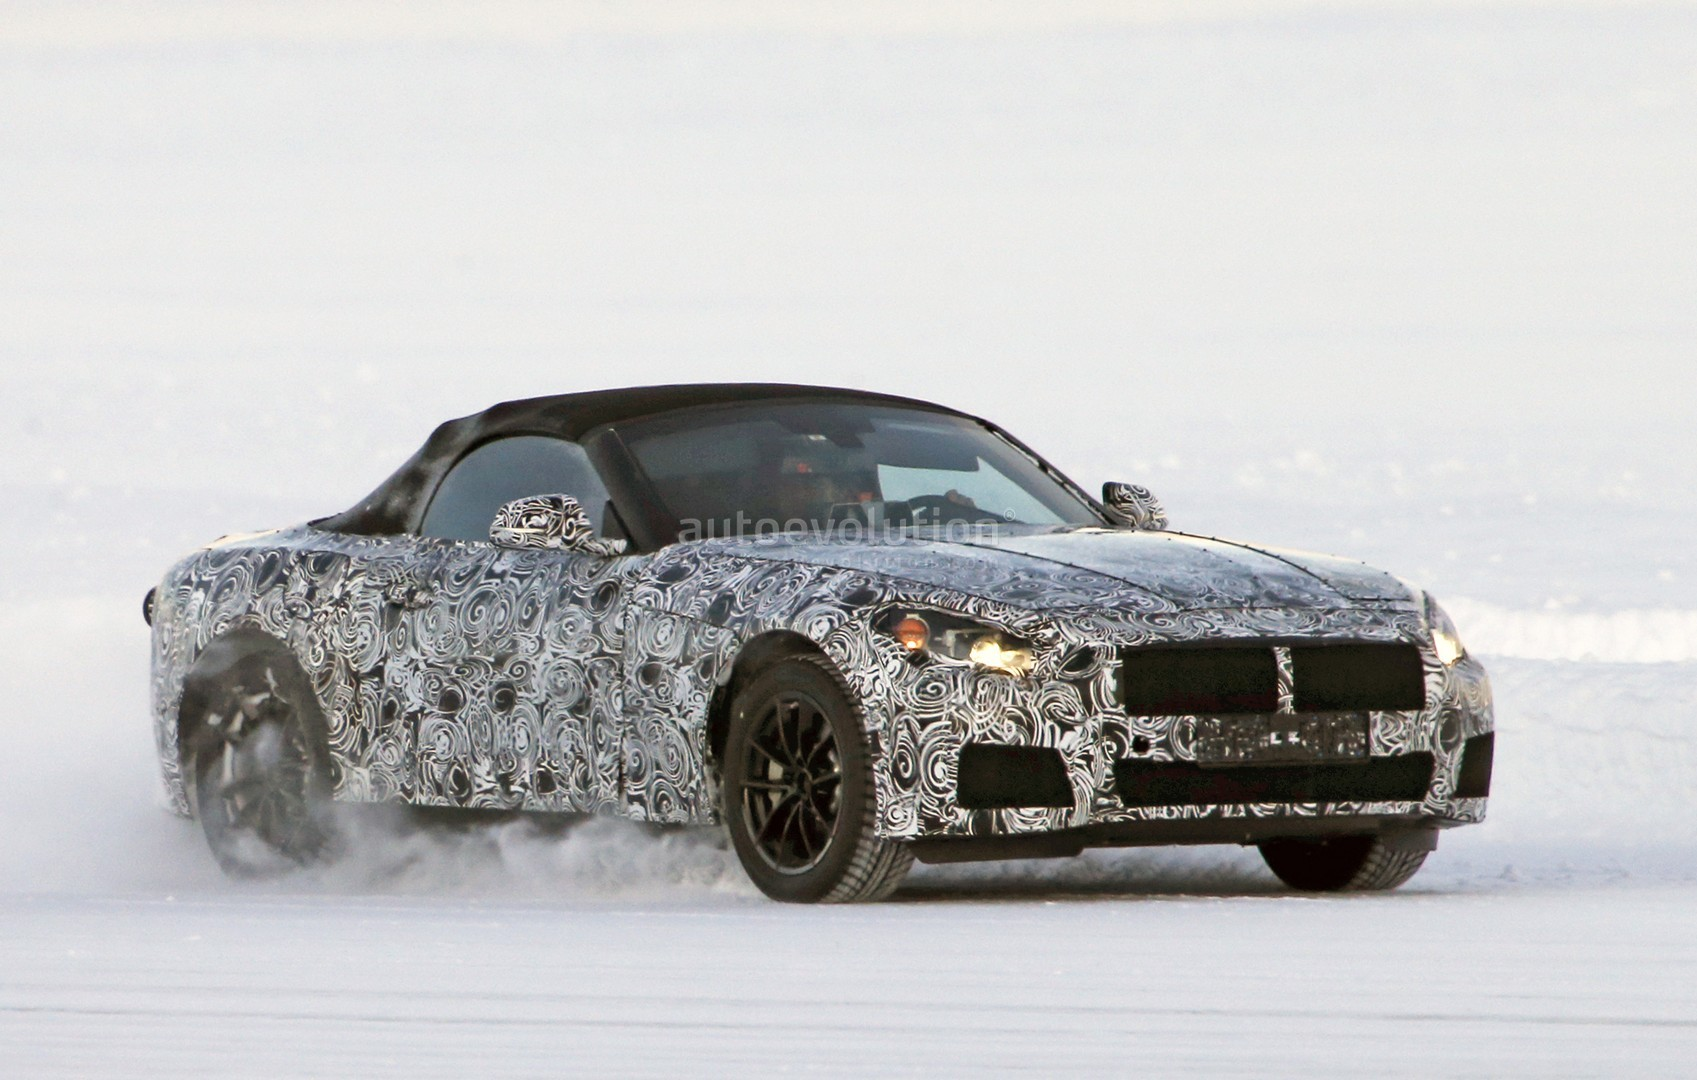 BMW Z5 to Be Build Alongside Supra, Expected to Borrow 330i